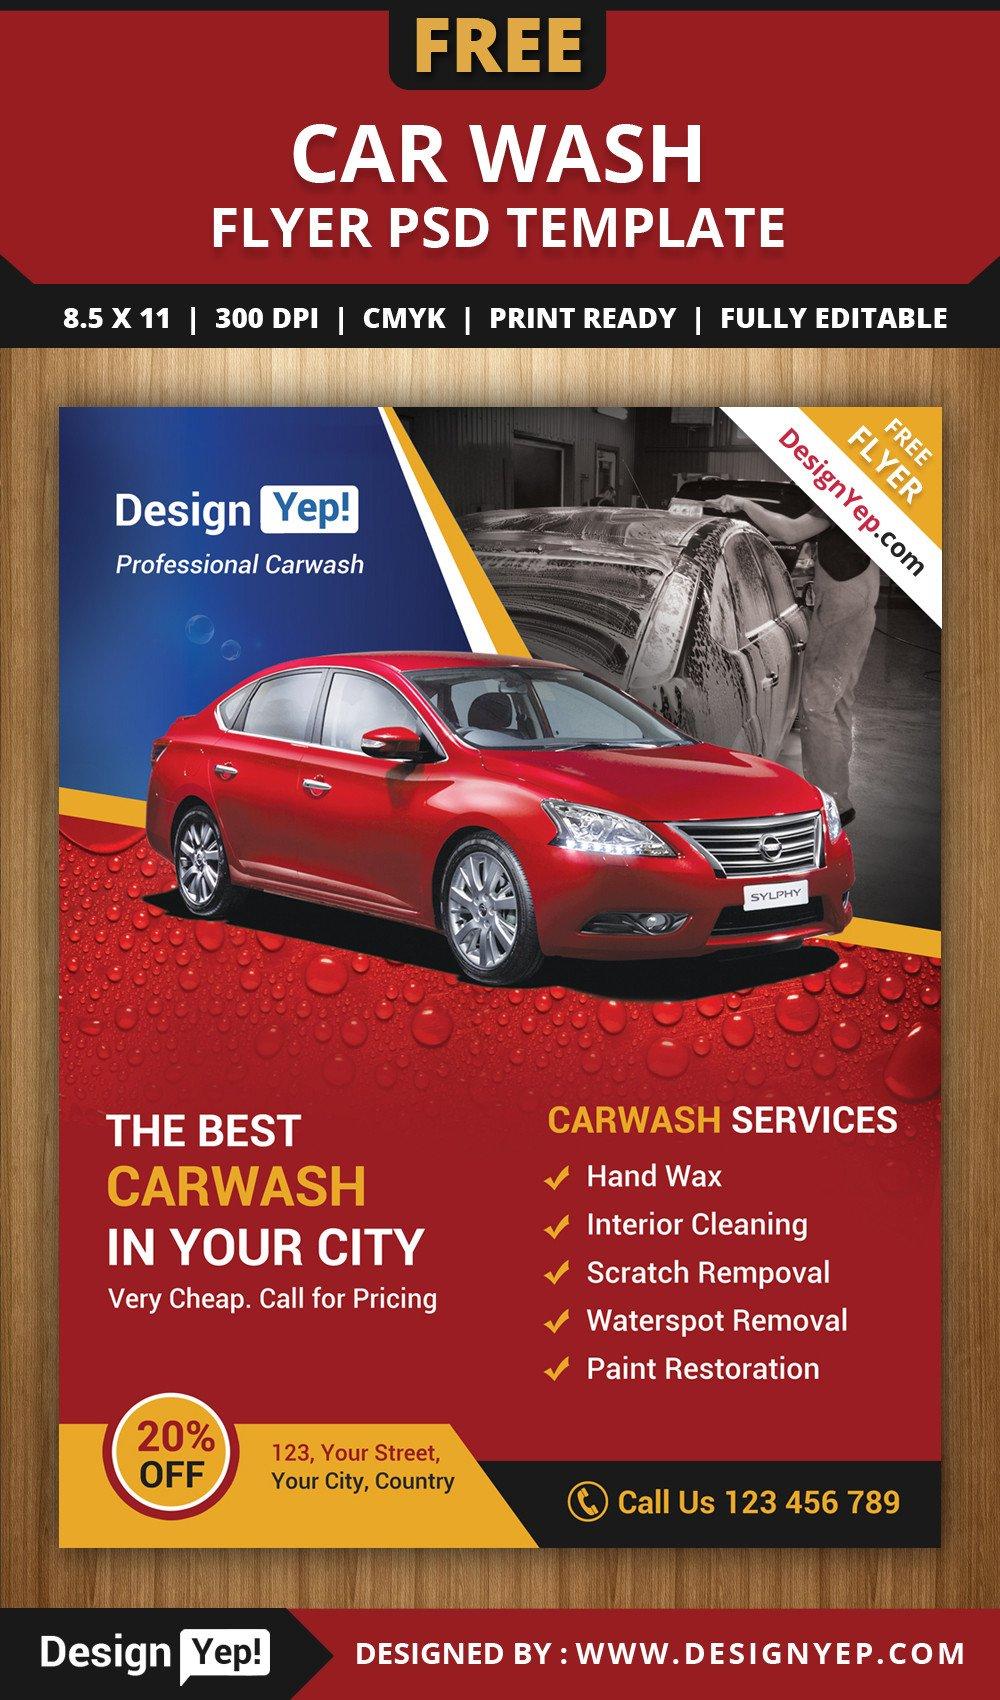 Car Wash Flyers Template Free Car Wash Flyer Psd Template Designyep